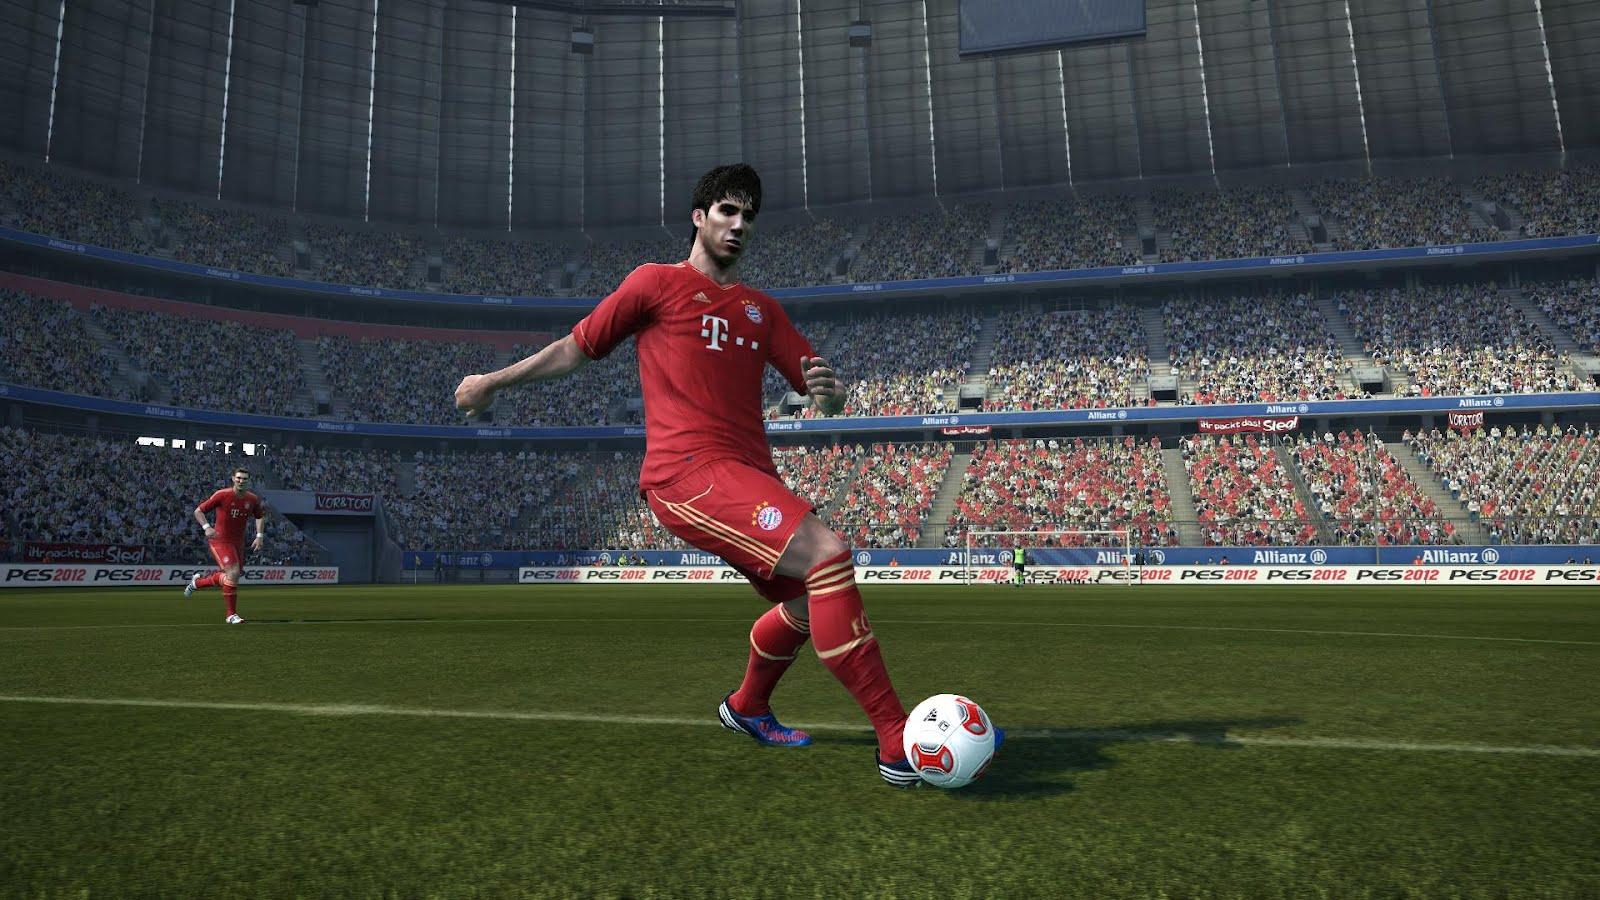 PES 2012 (Pro Evolution Soccer 2012) - патч и nodvd/nocd для игры.